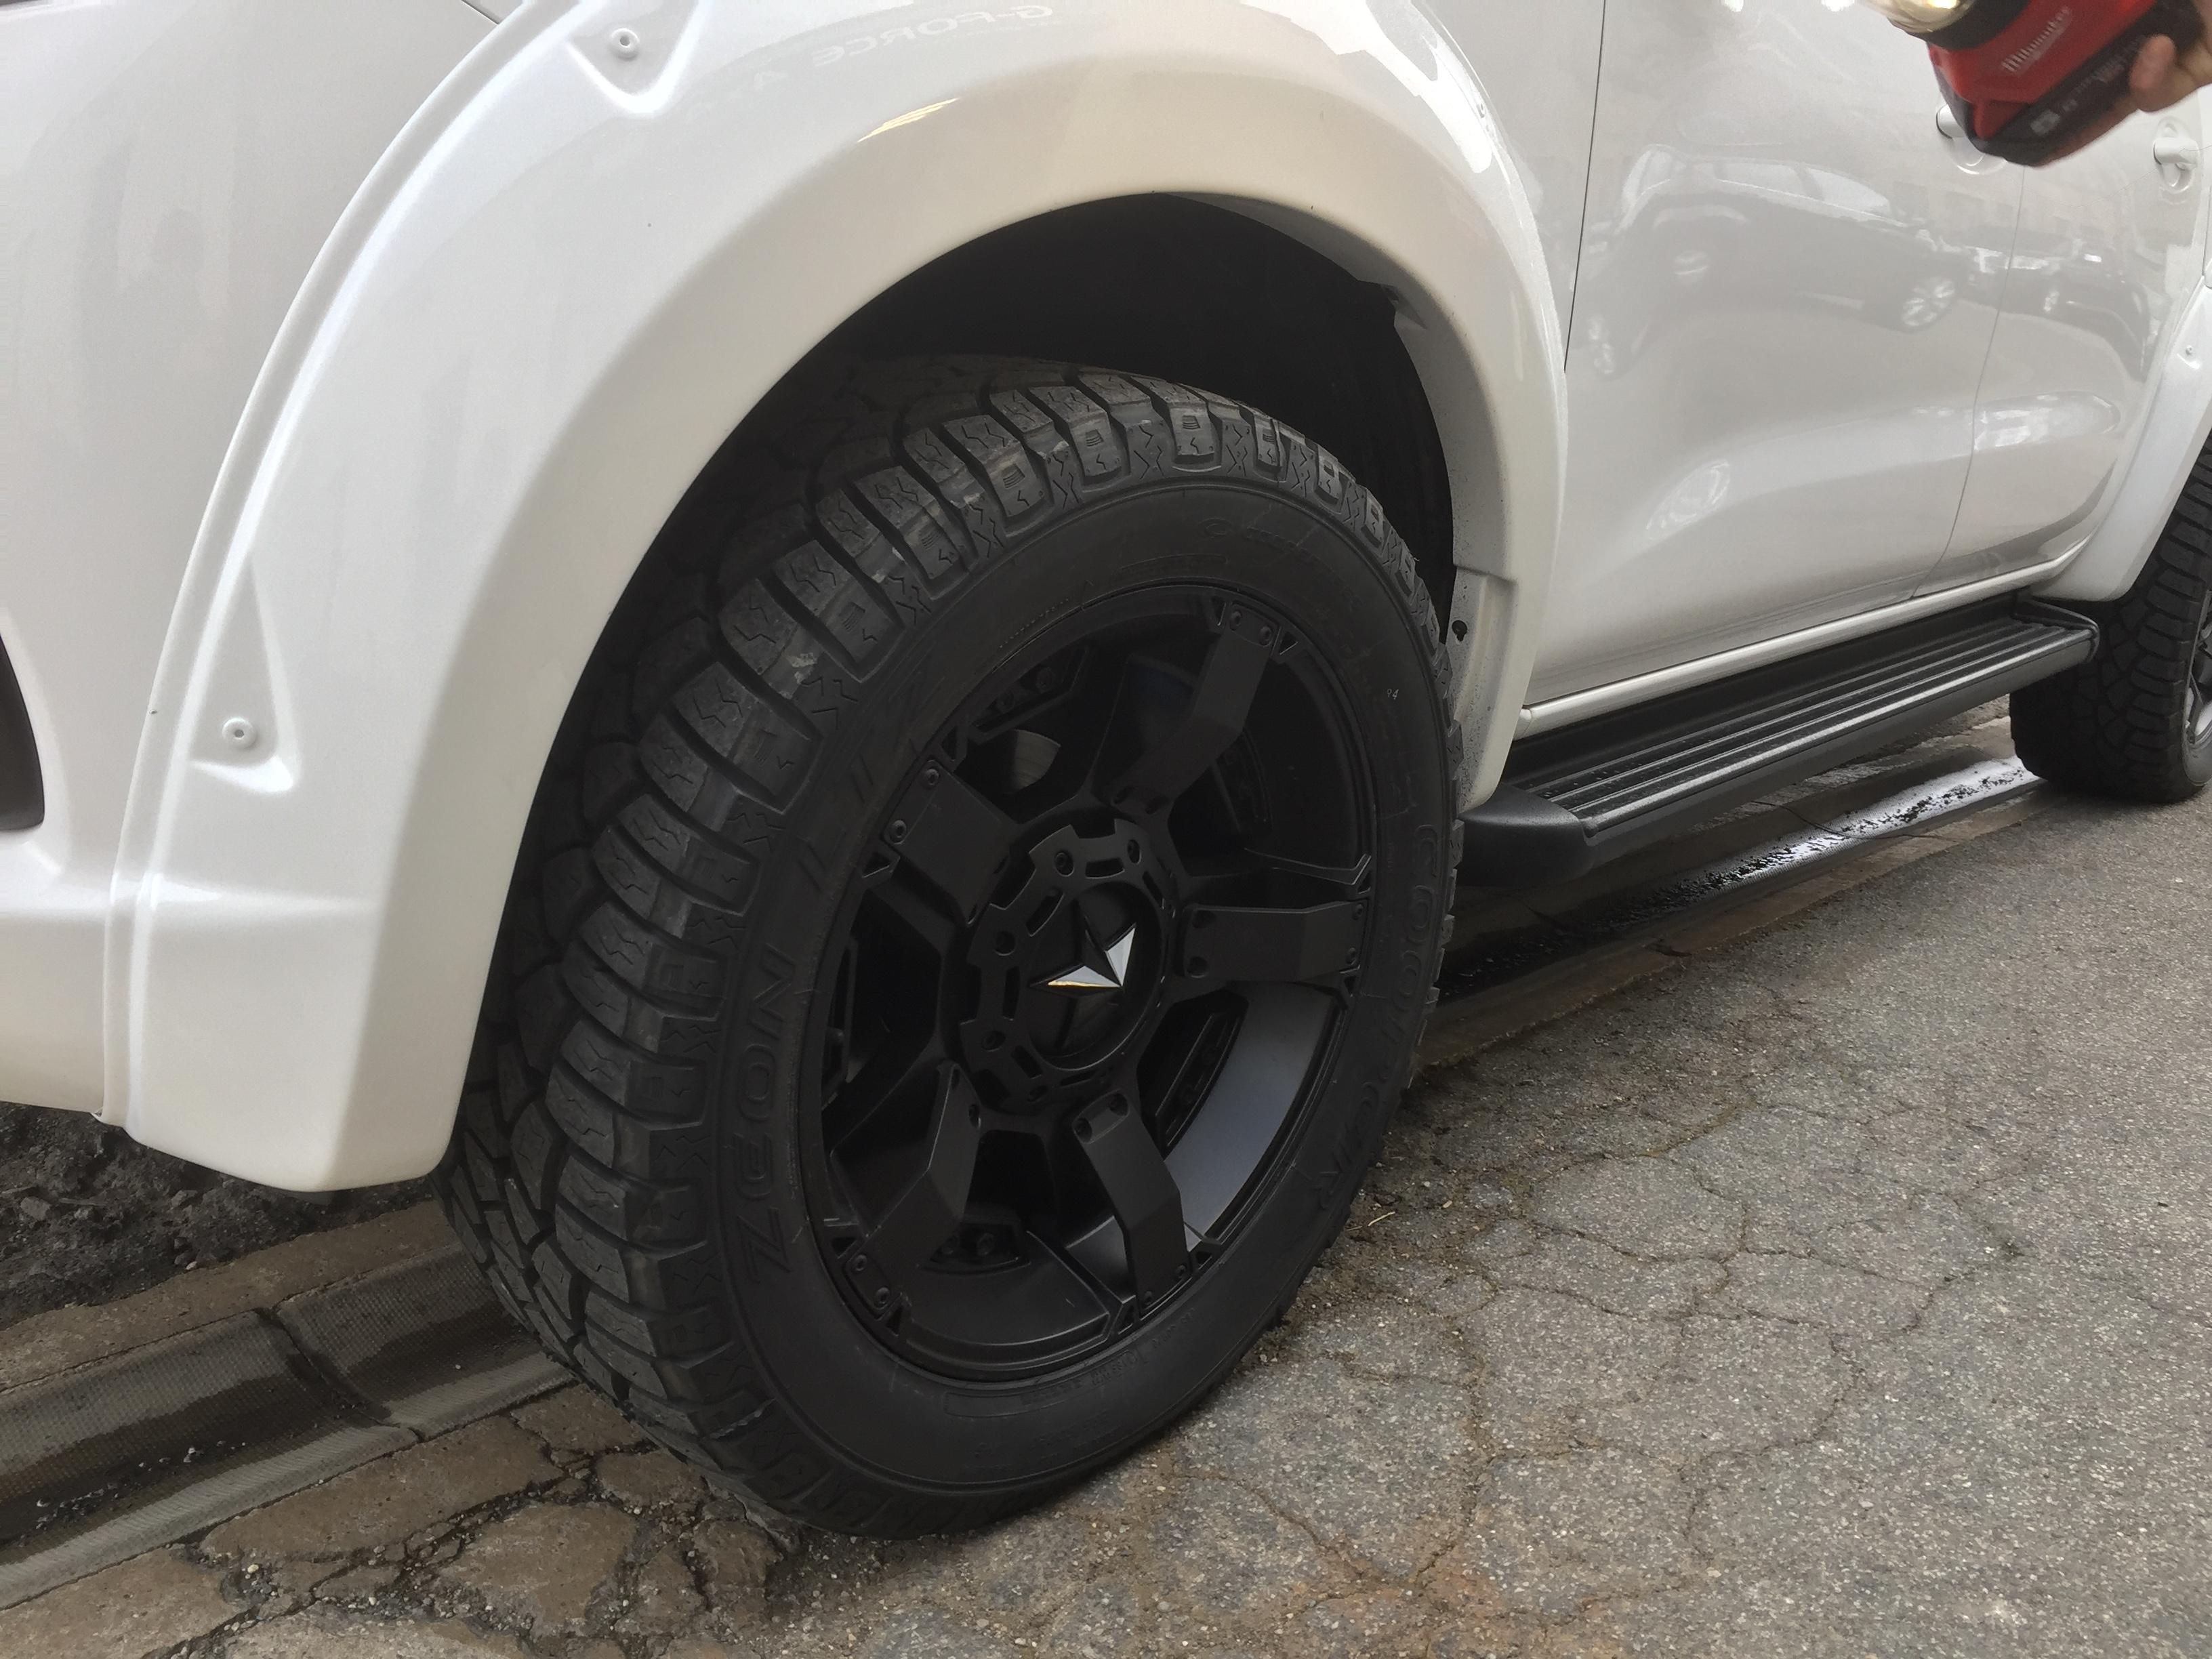 2015 Range Rover Price >> NISSAN NP300 EXTREME FENDER FLARES MATT BLACK